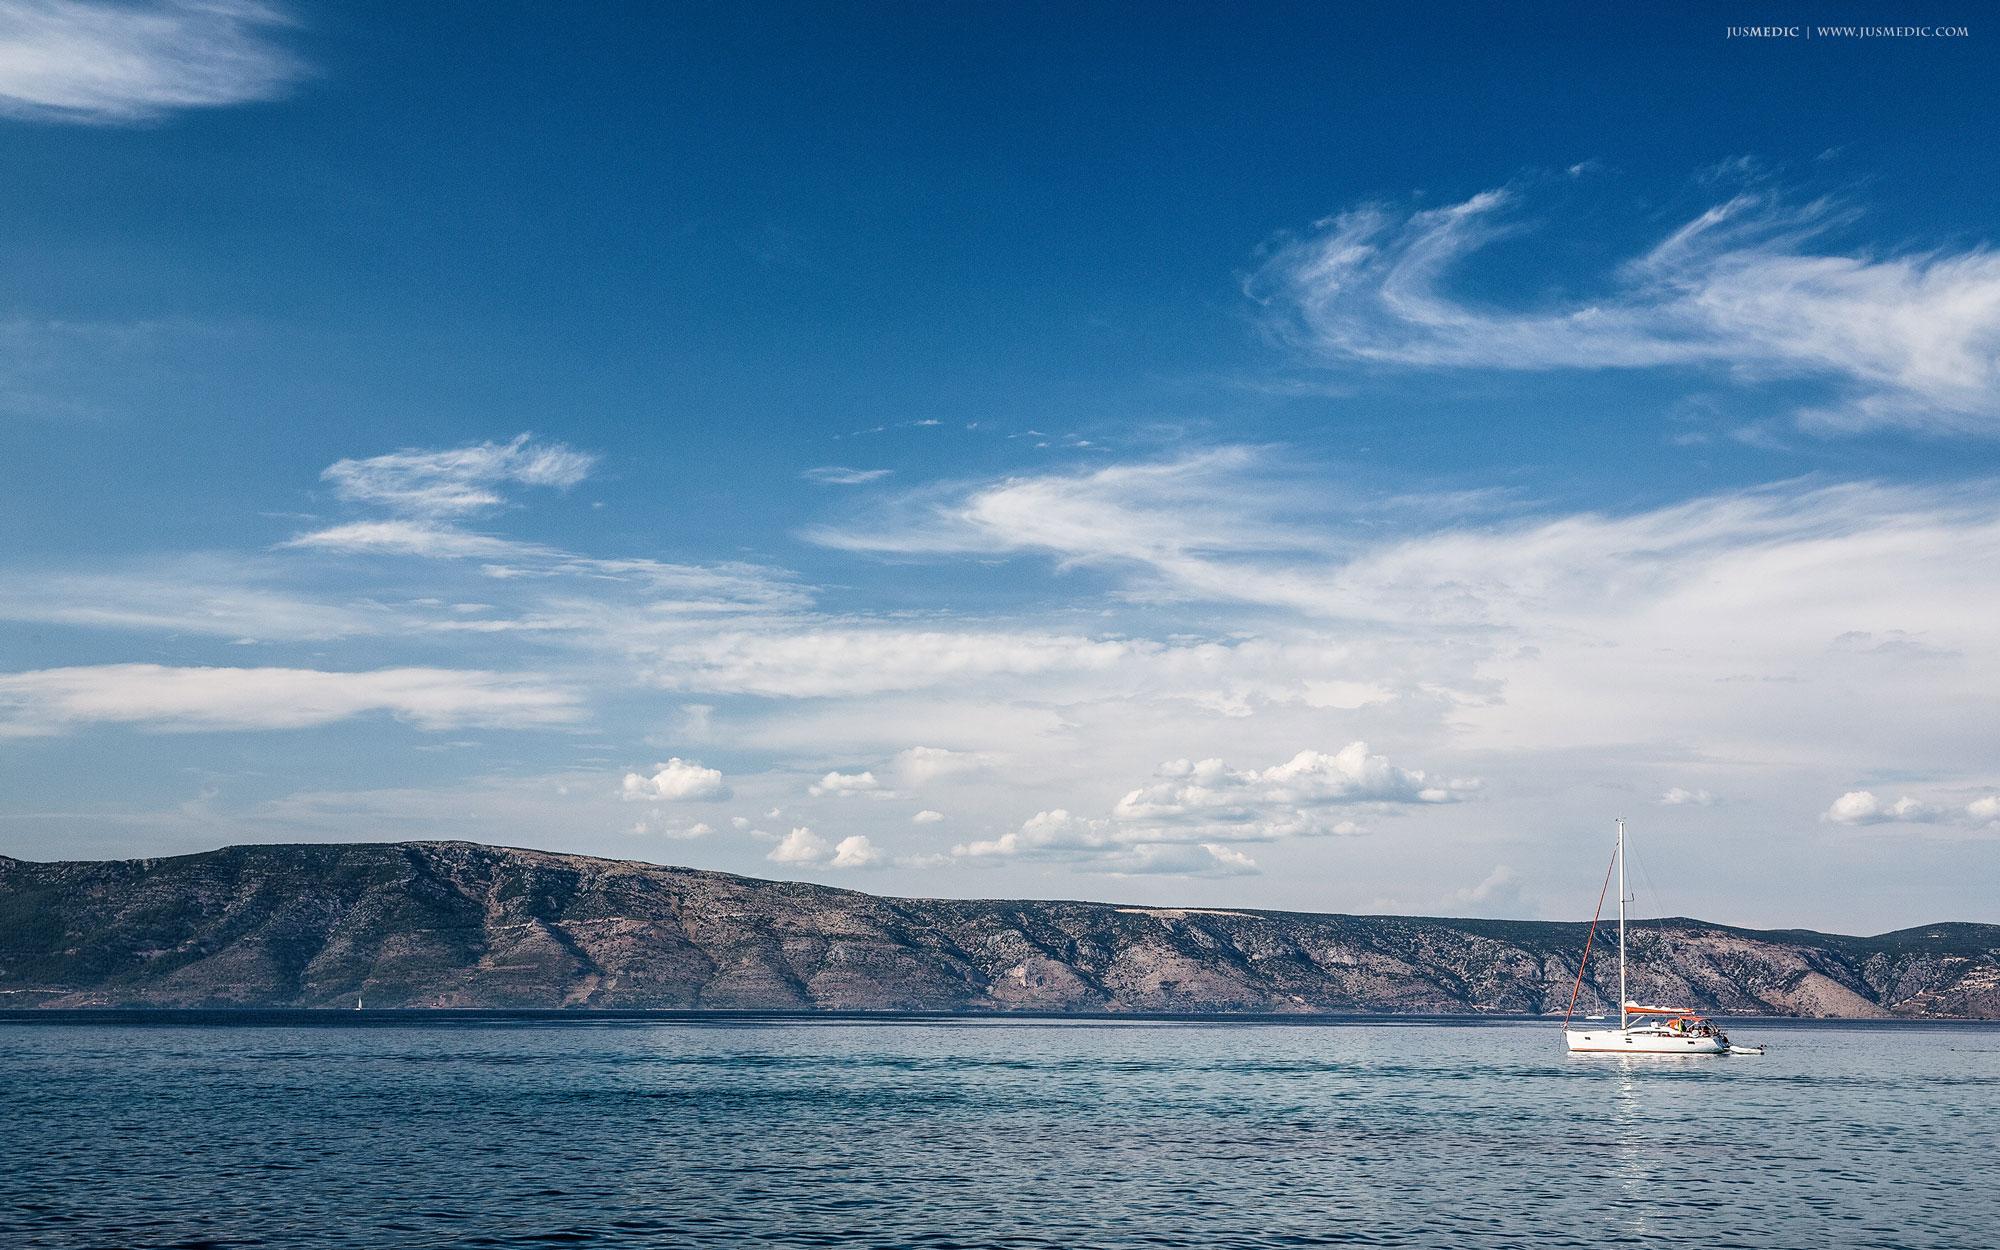 09-16-Sailing-Dalmatia-jusmedic.com-2000px